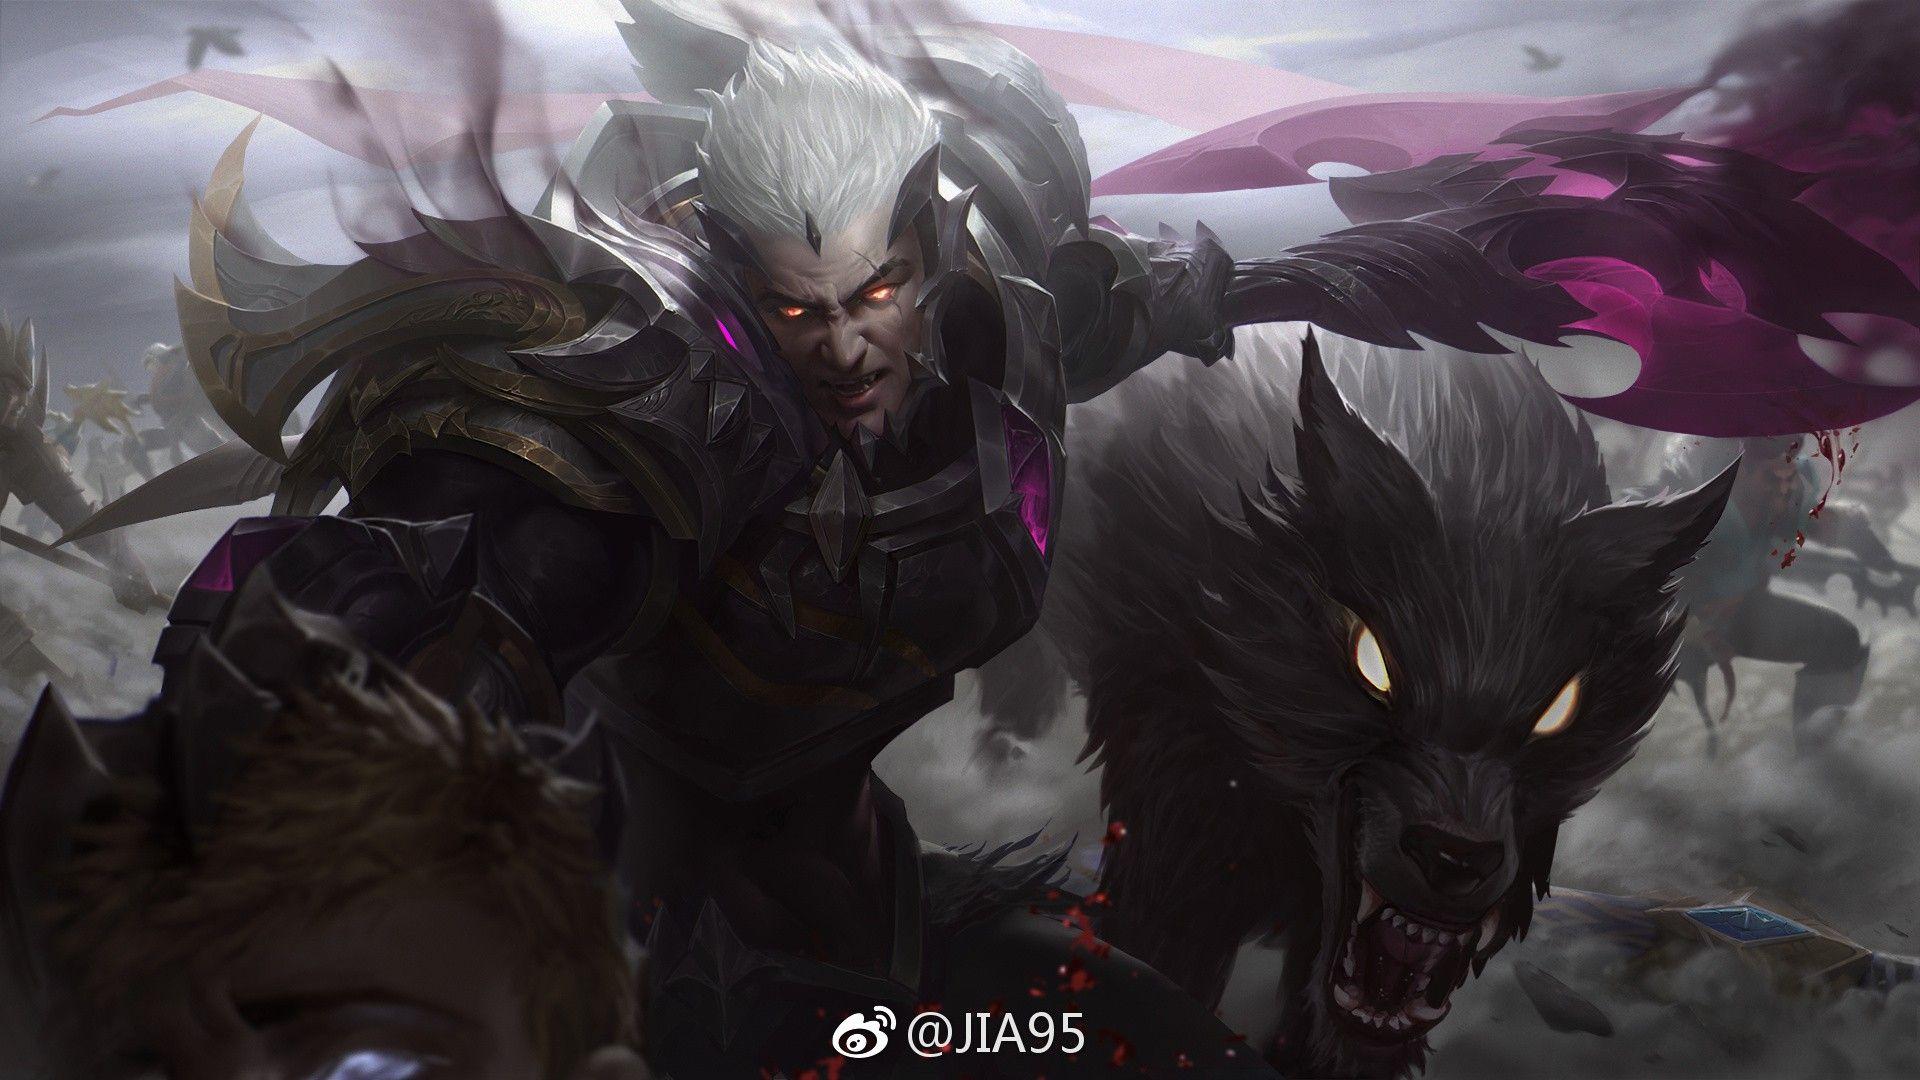 Darius League Of Legends Leona League Of Legends Capas Para